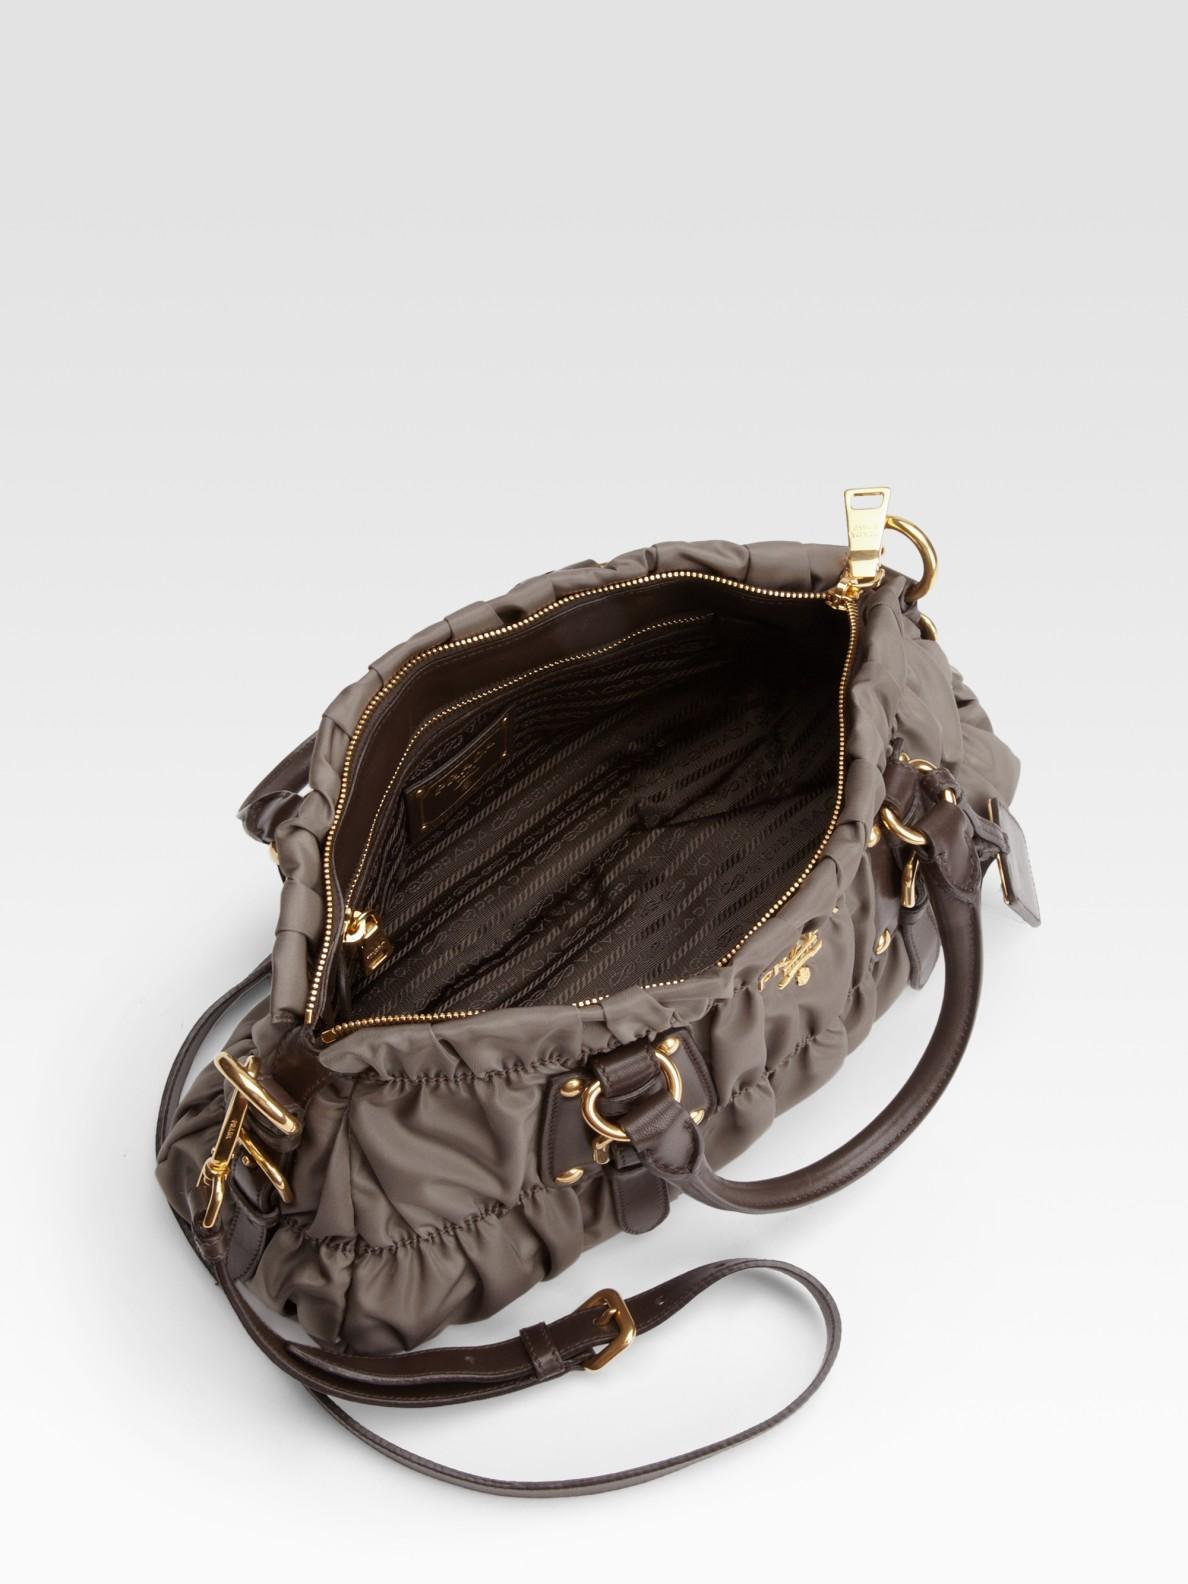 prada black and white handbag - Prada Tessuto Gaufre Nylon Satchel in Gray (grey)   Lyst